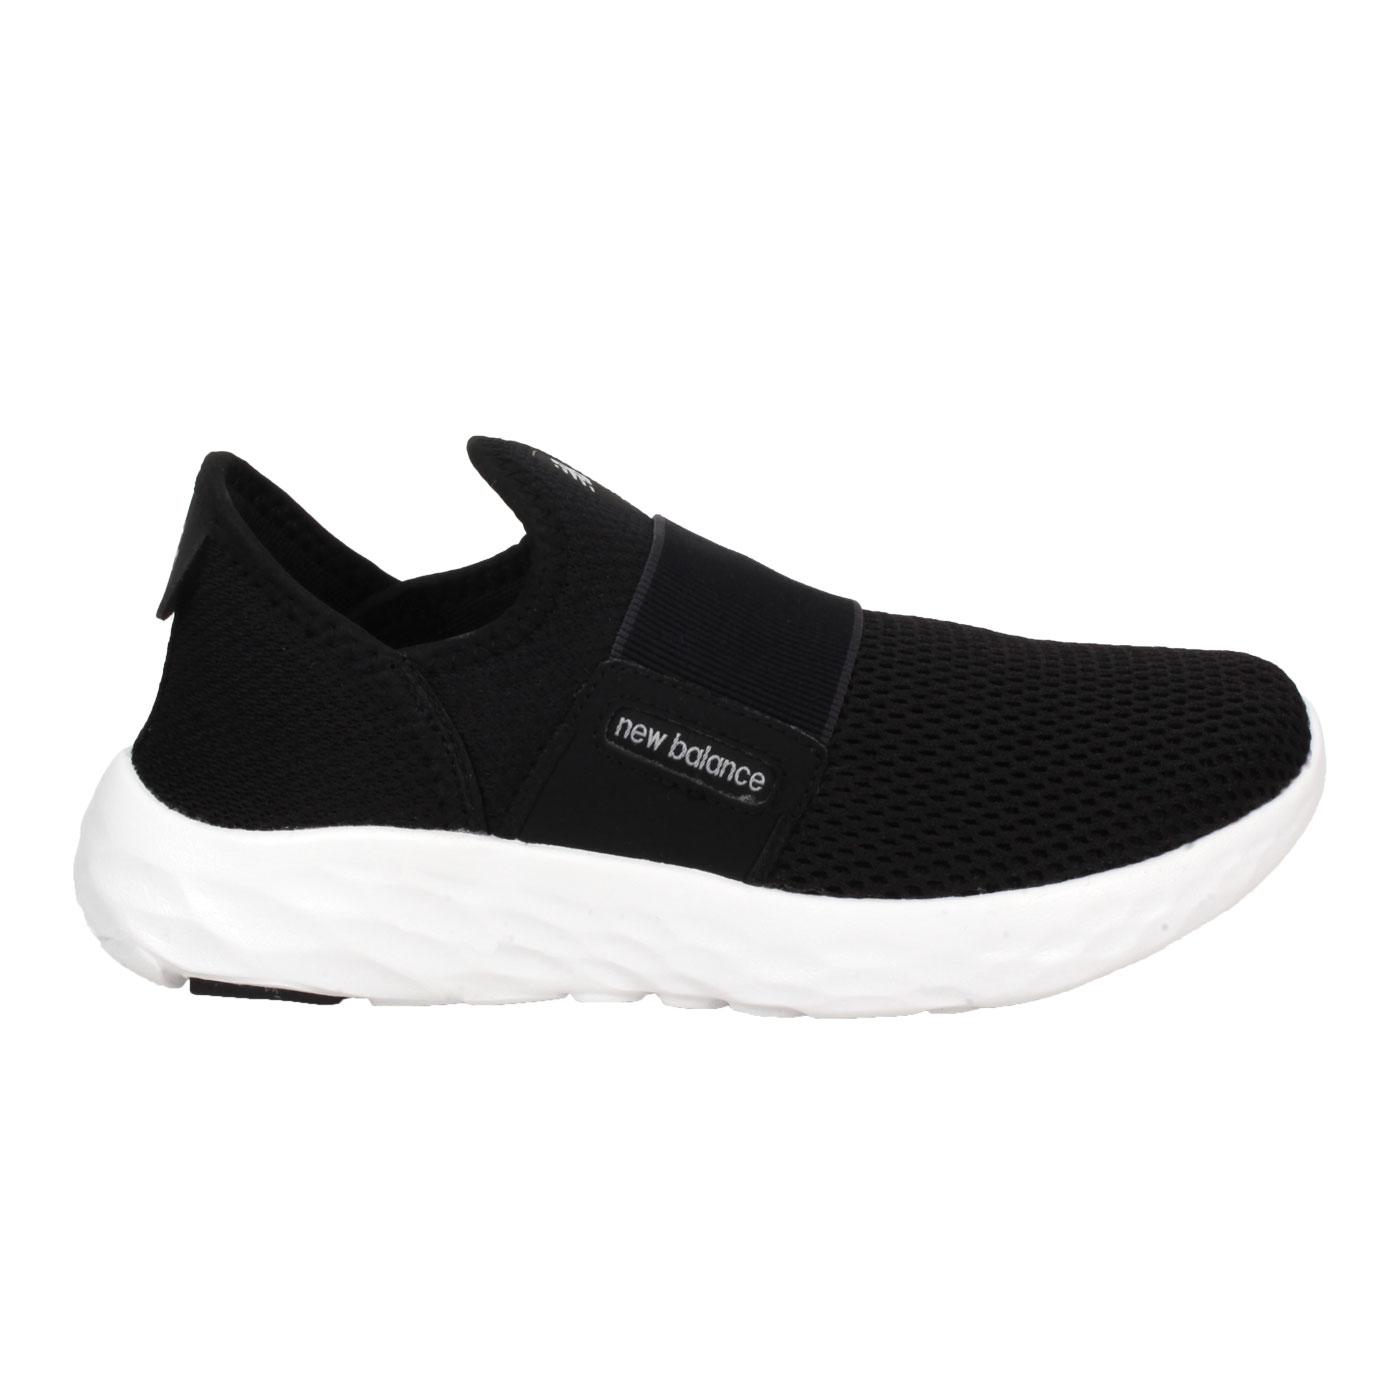 NEW BALANCE 女款運動休閒鞋-WIDE WSPTSSB2 - 黑白